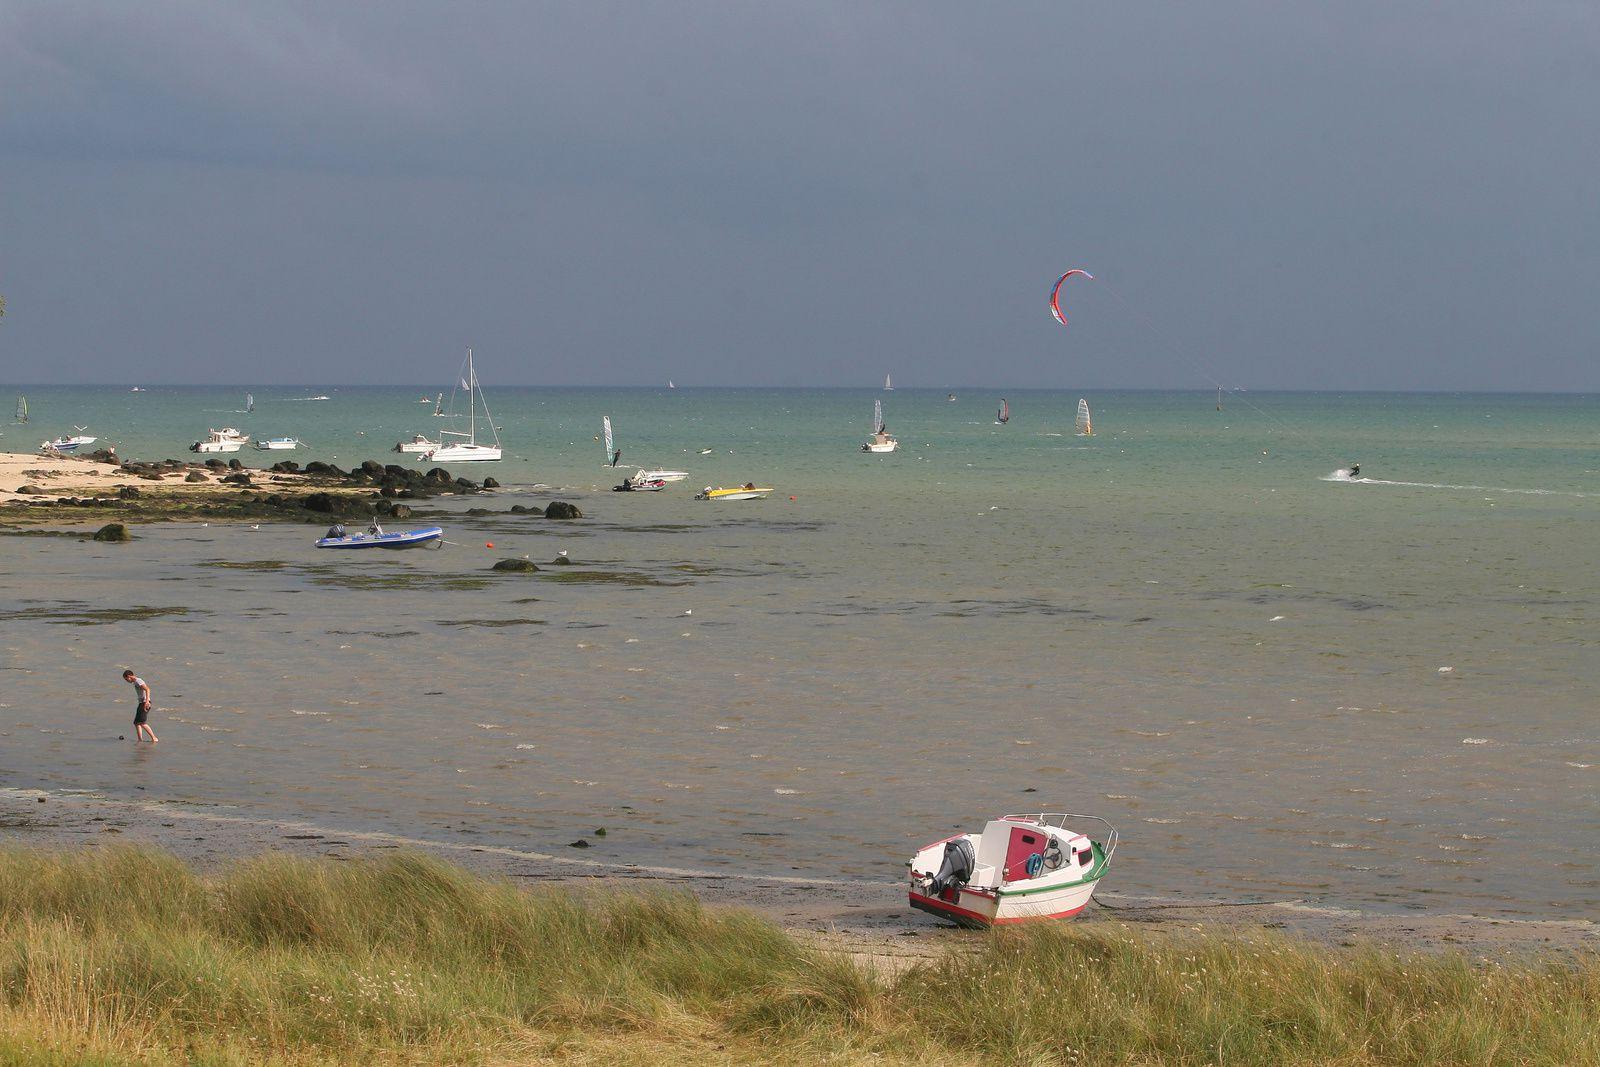 Bateaux, kitesurf et promeneur